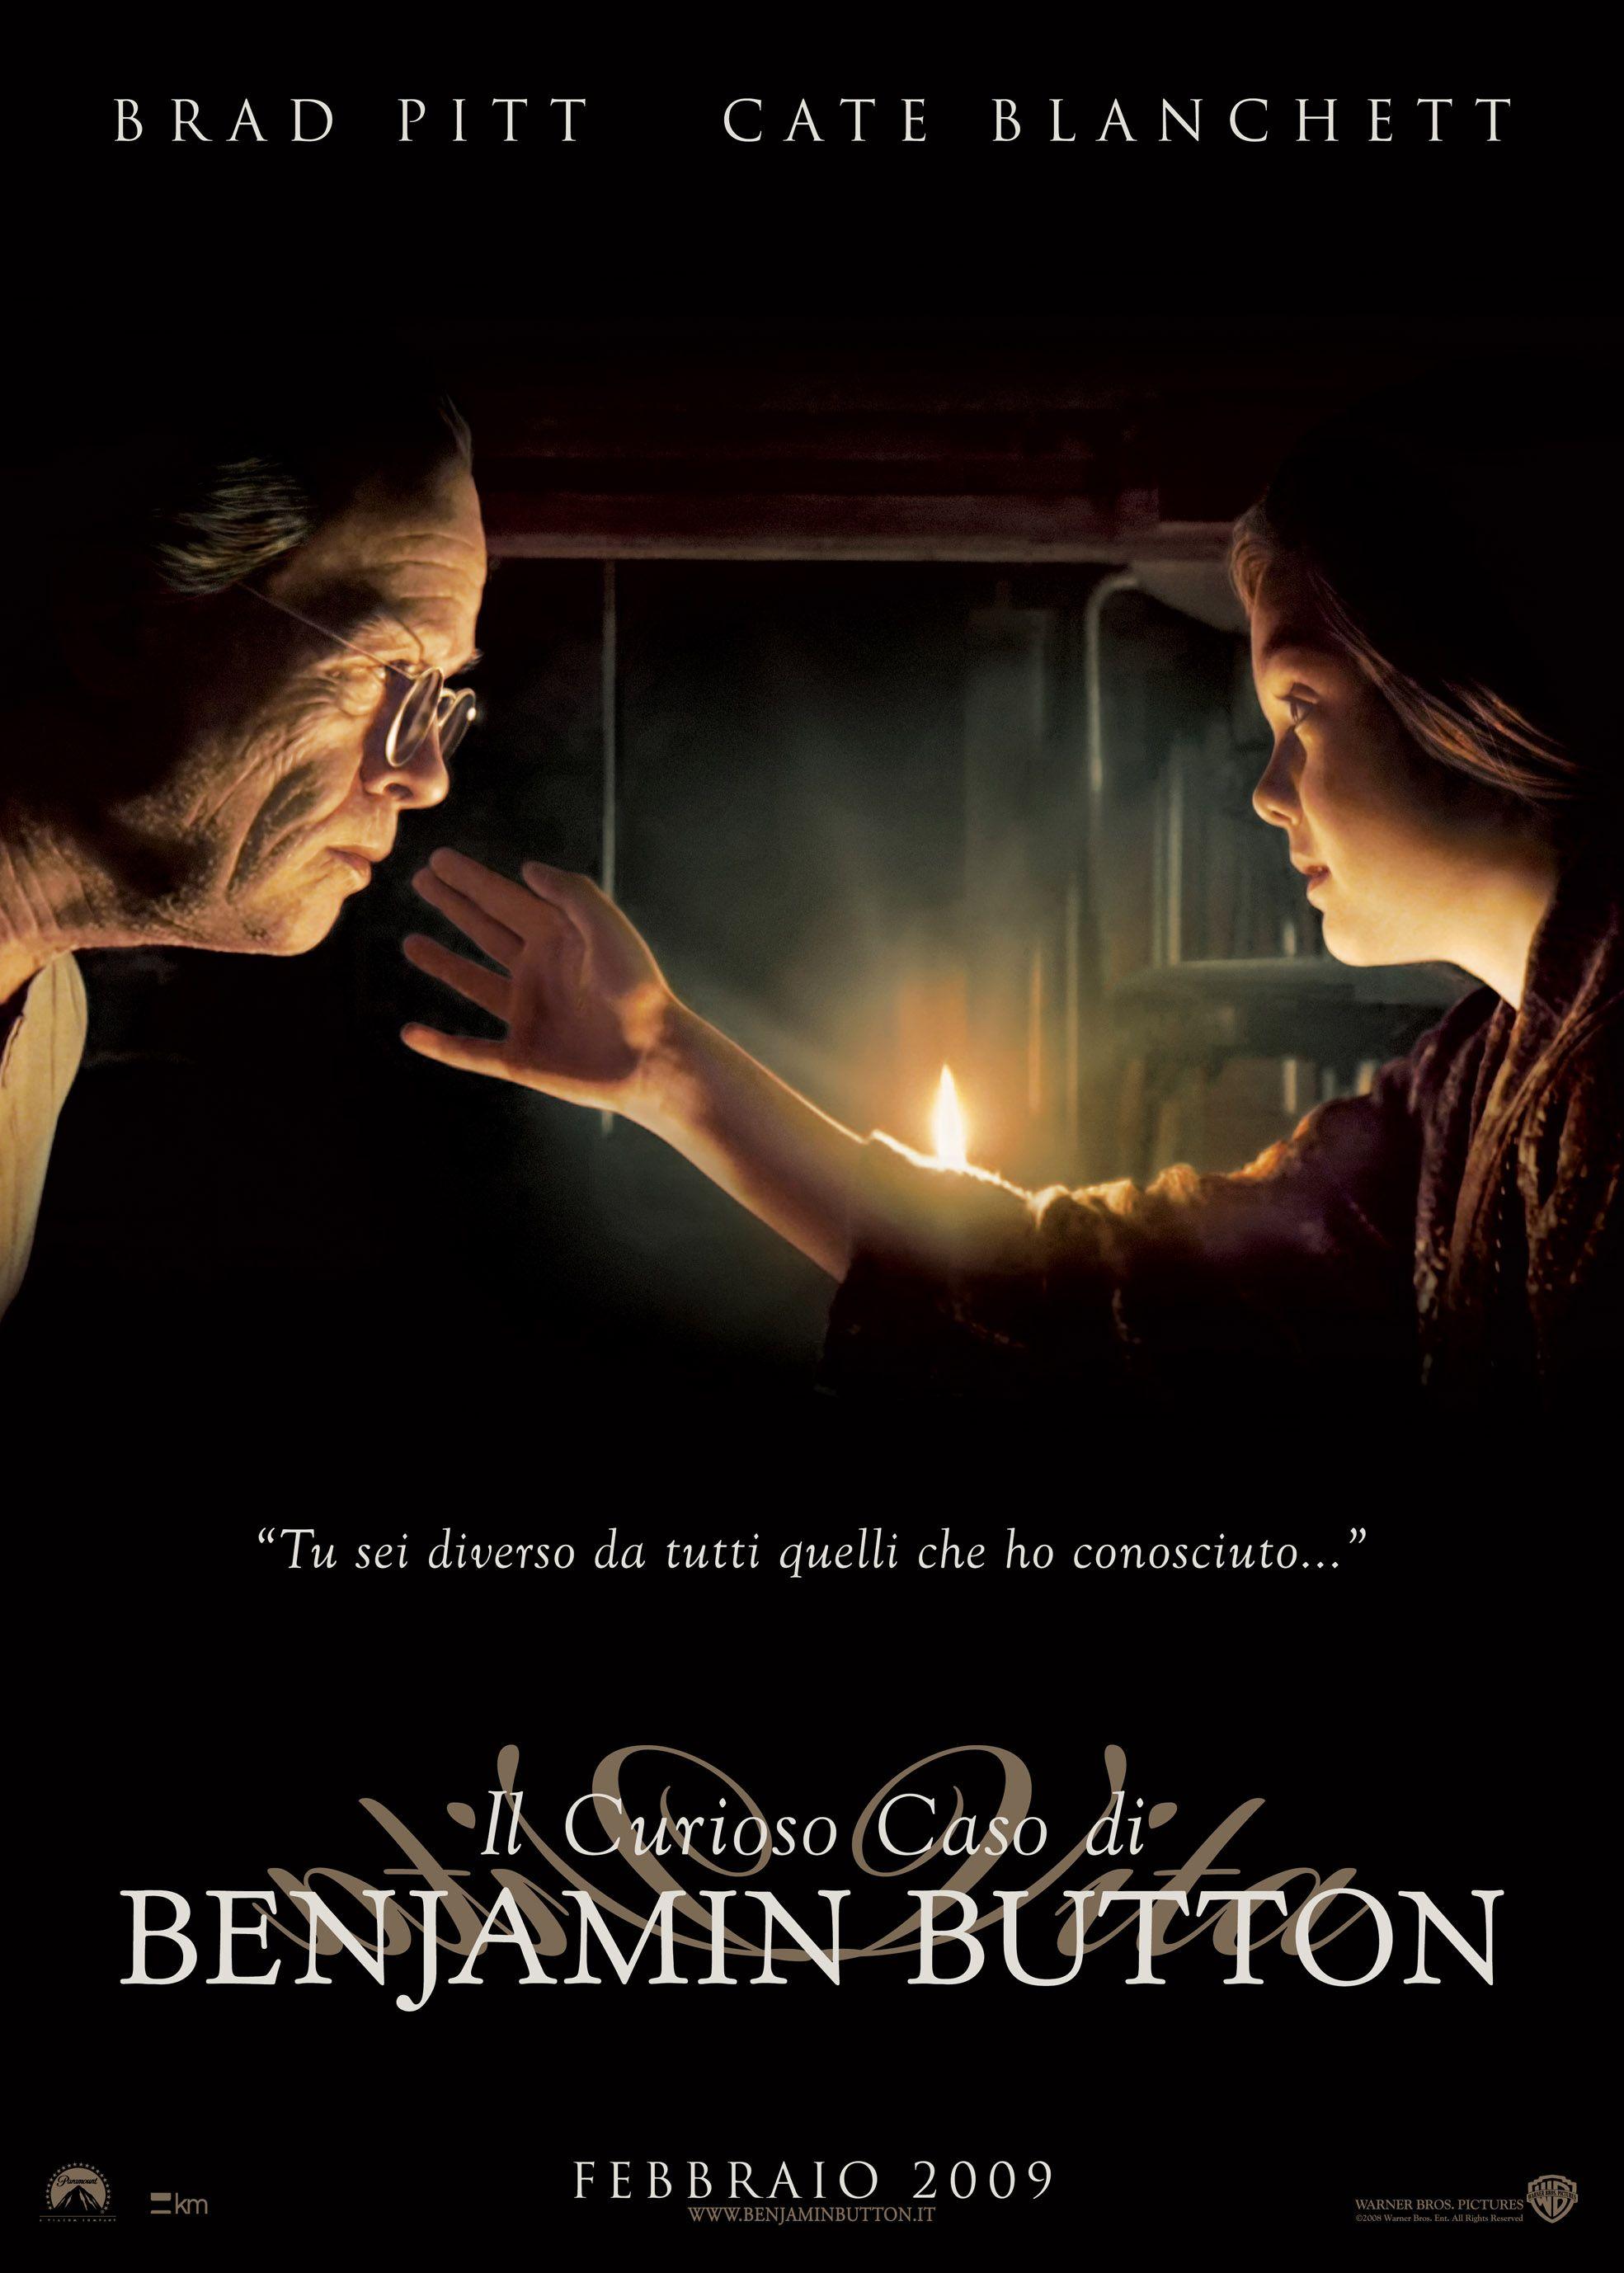 DUBLADO BUTTON ESTRANHO BAIXAR DE BENJAMIN CASO O